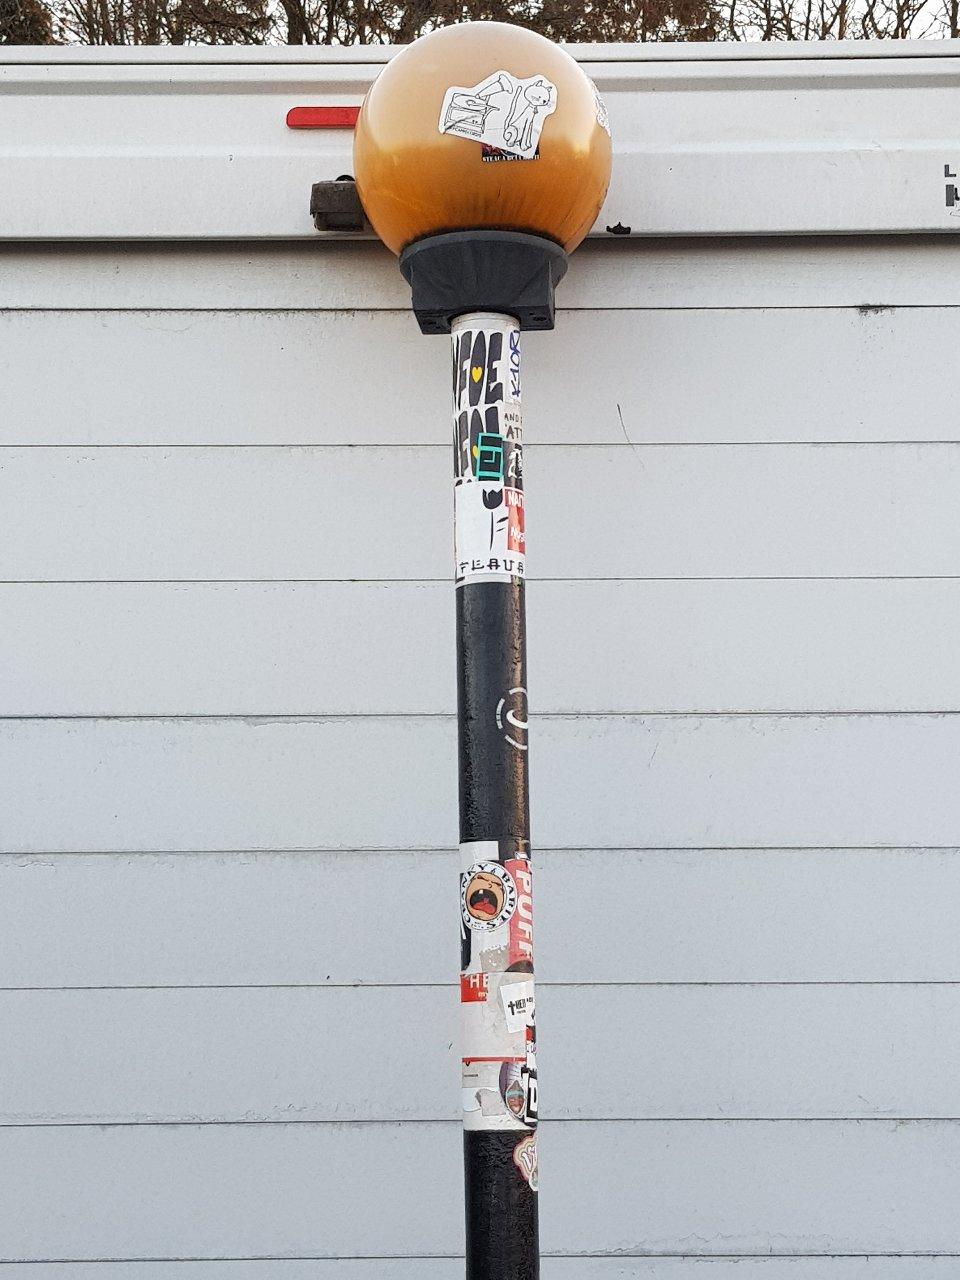 Abbey Rd (The Beatles) Pedestrian Post